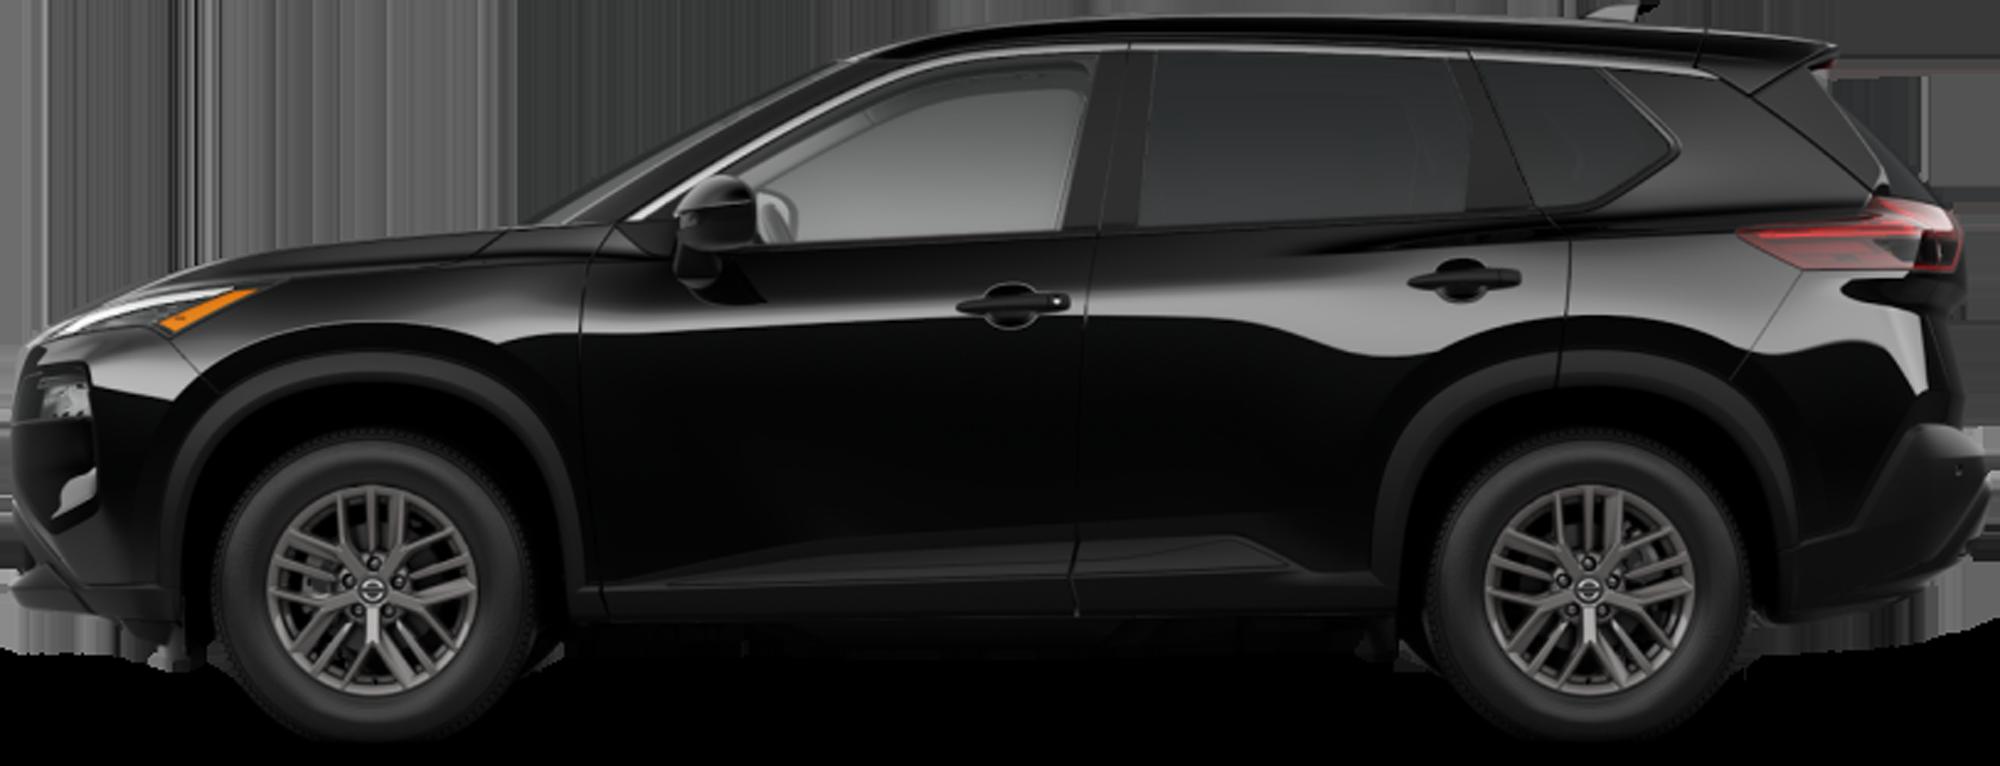 2021 Nissan Rogue SUV S